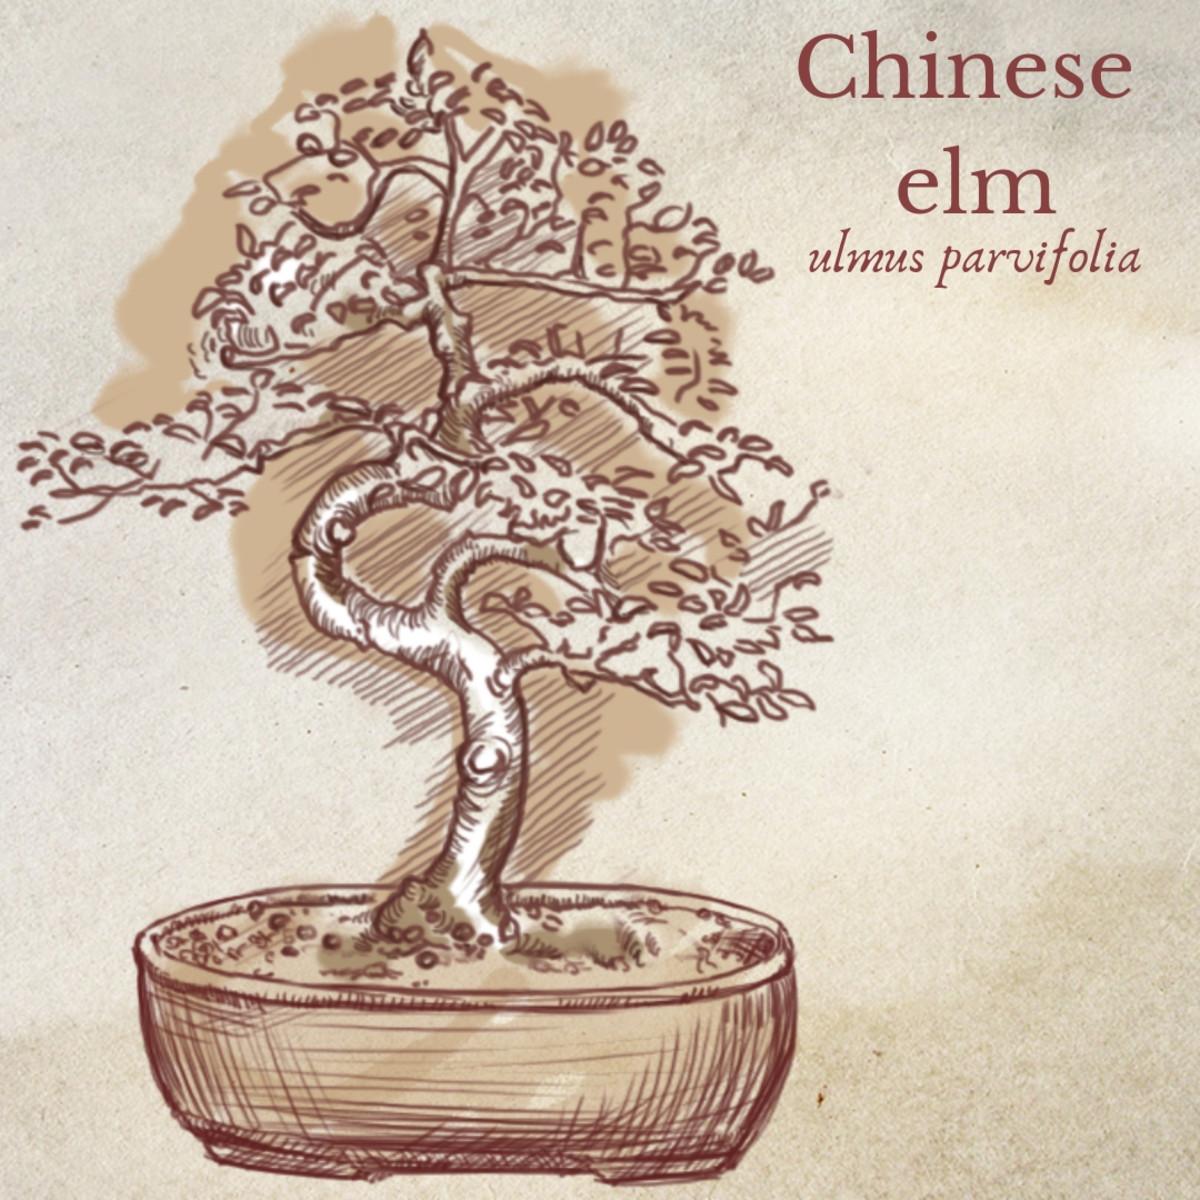 Illustration of Chinese Elm